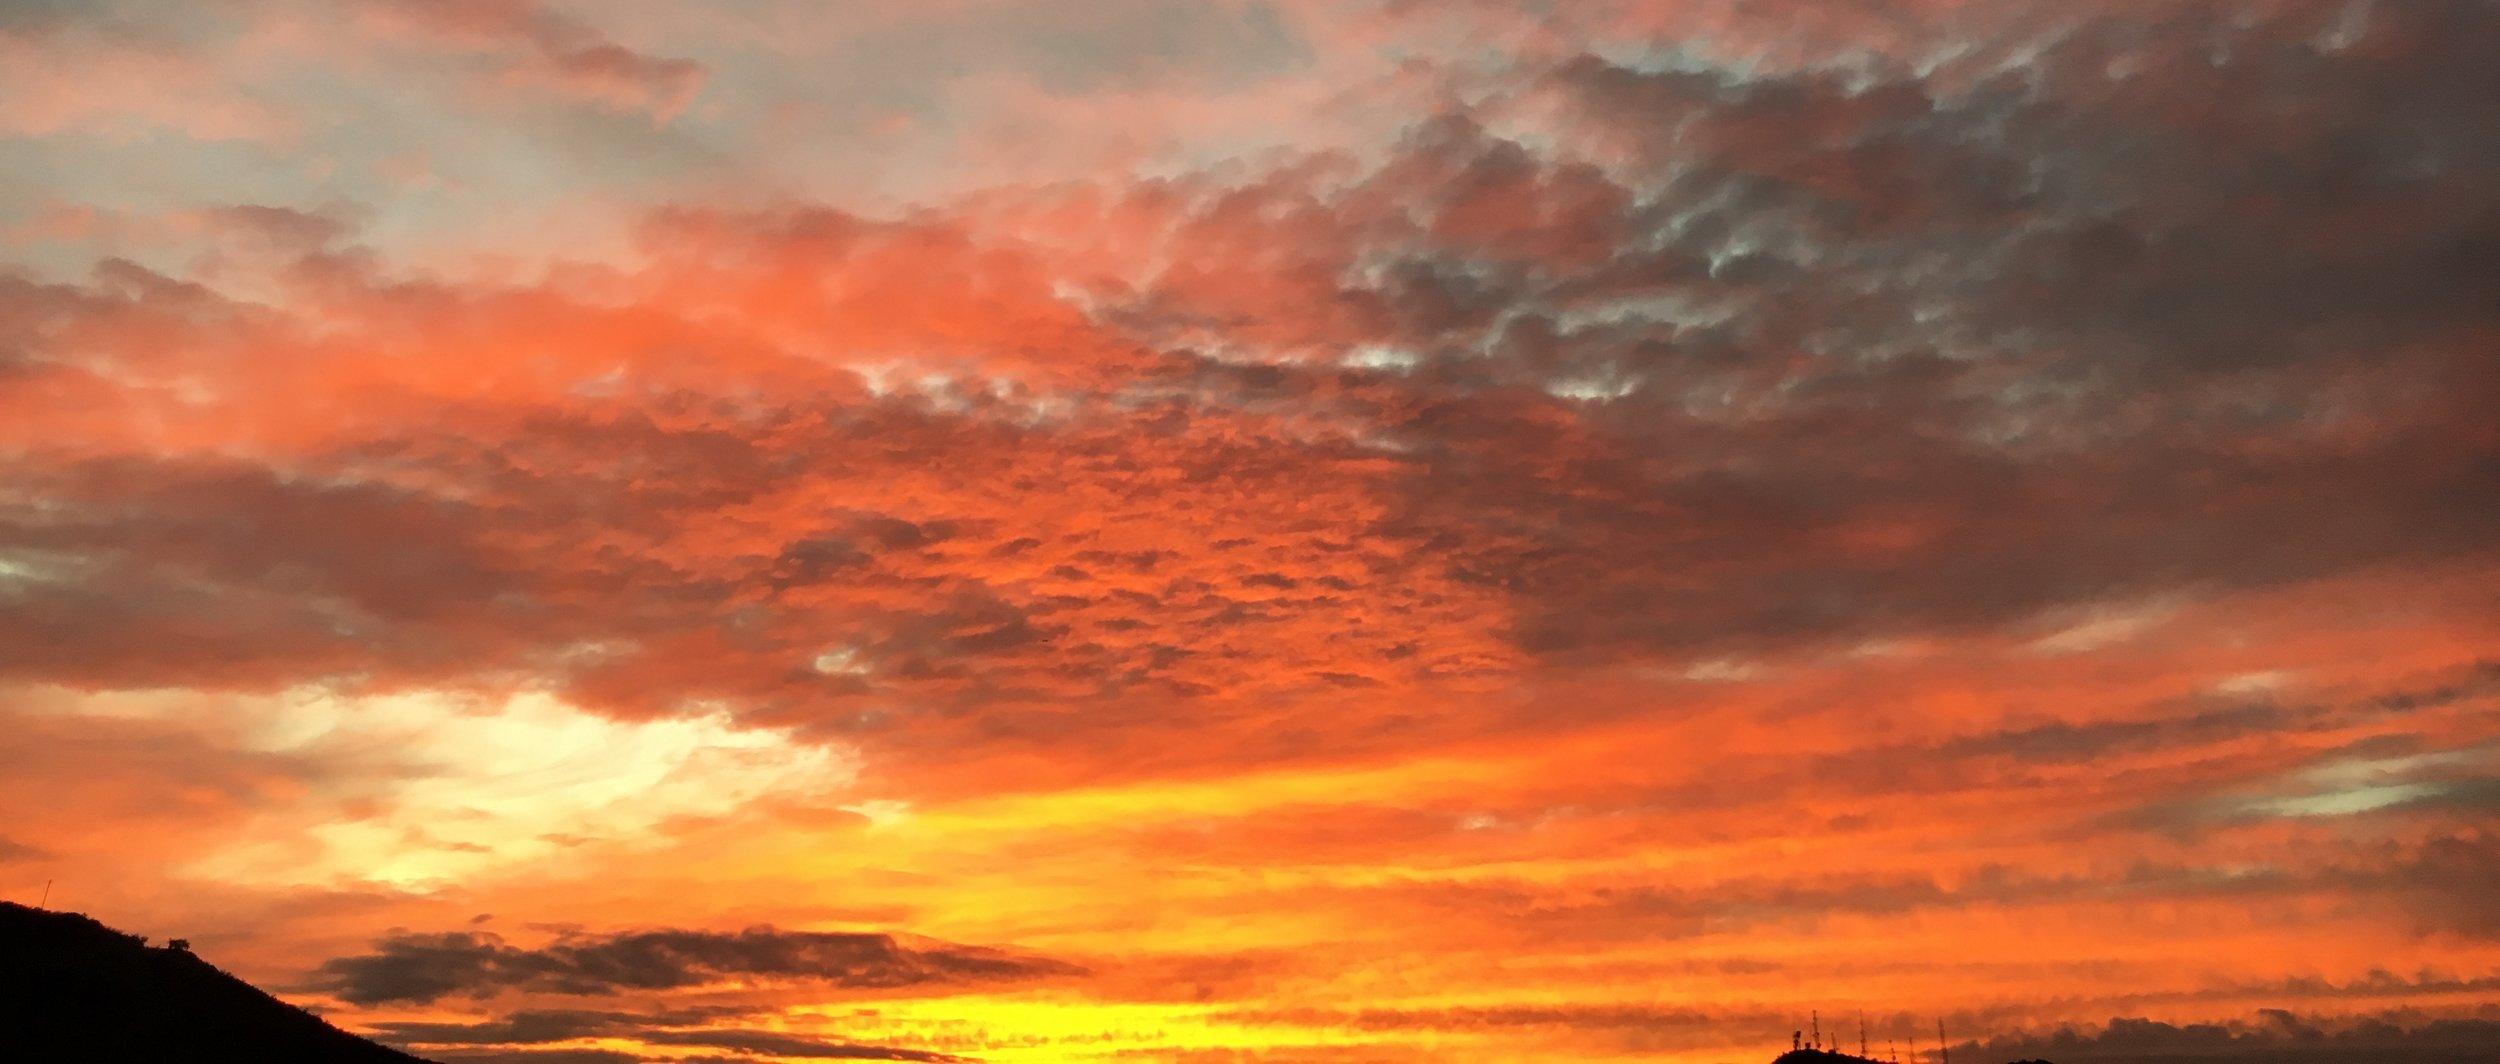 Sunset in Phoenix, Arizona!